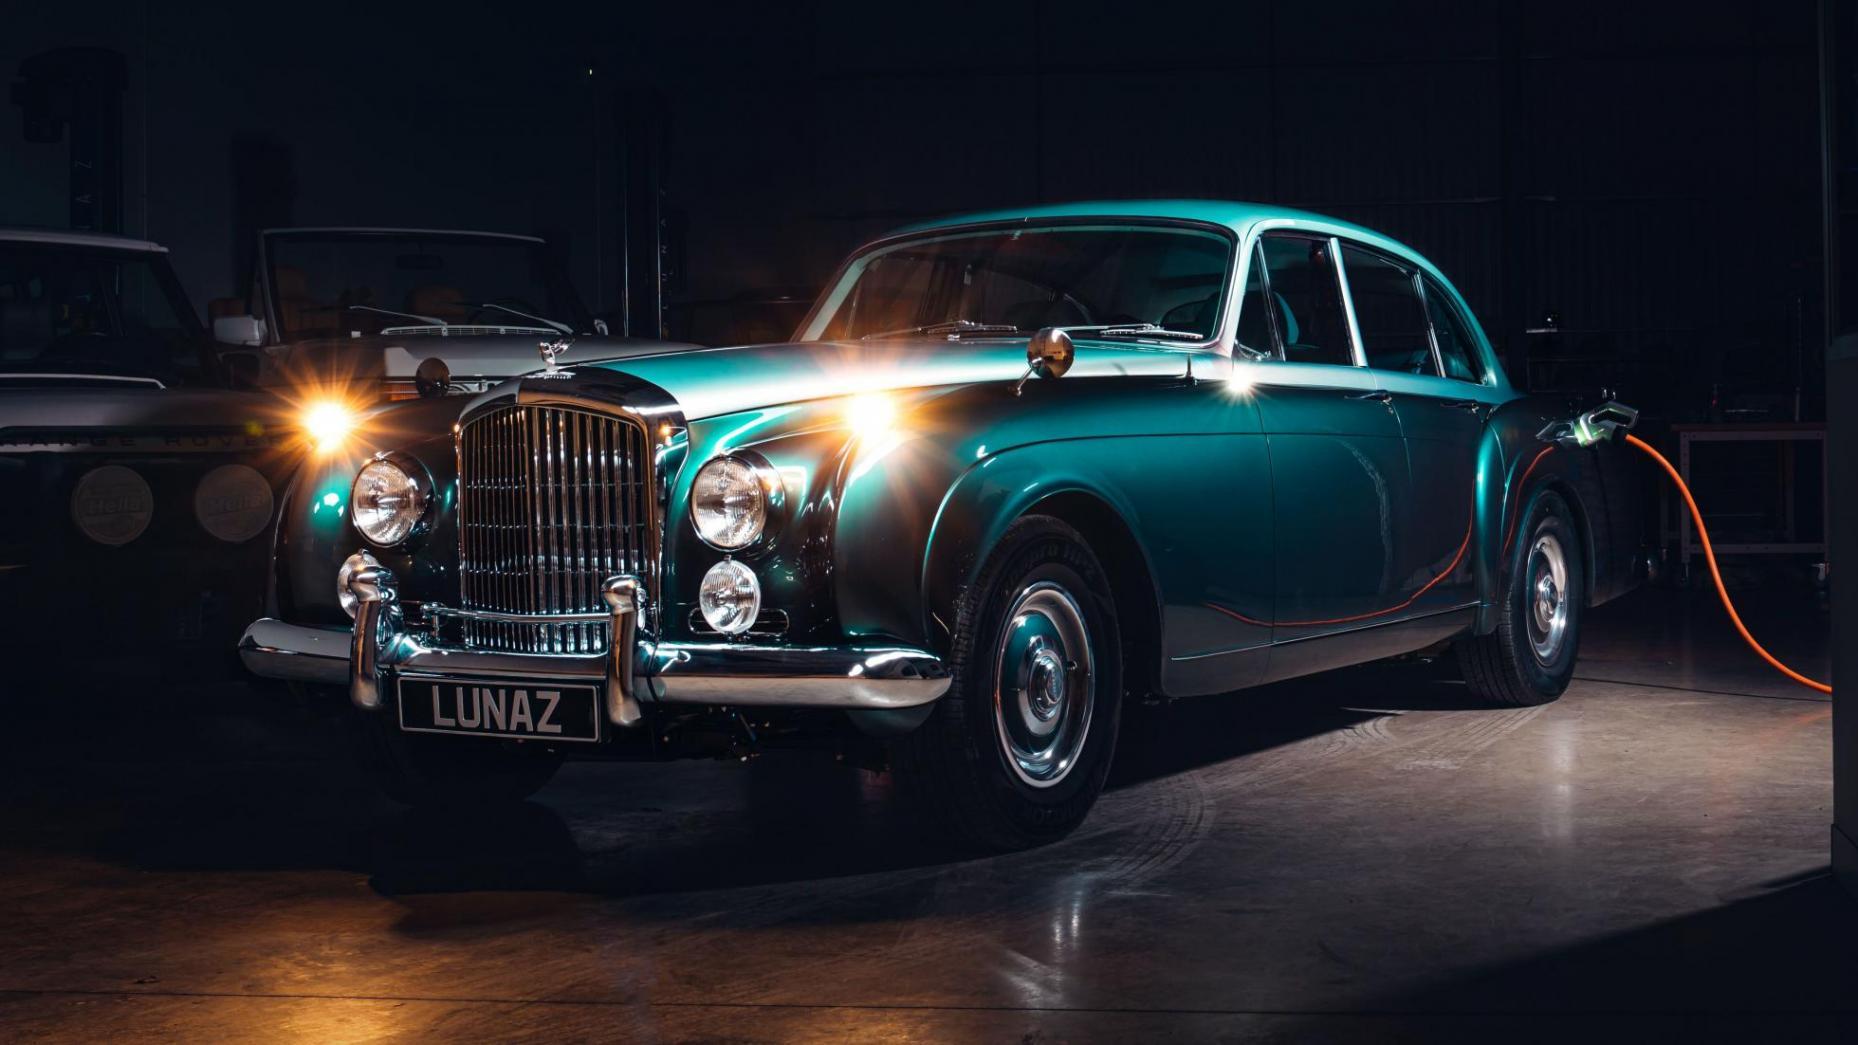 Lunaz Bentley Continental Flying Spur